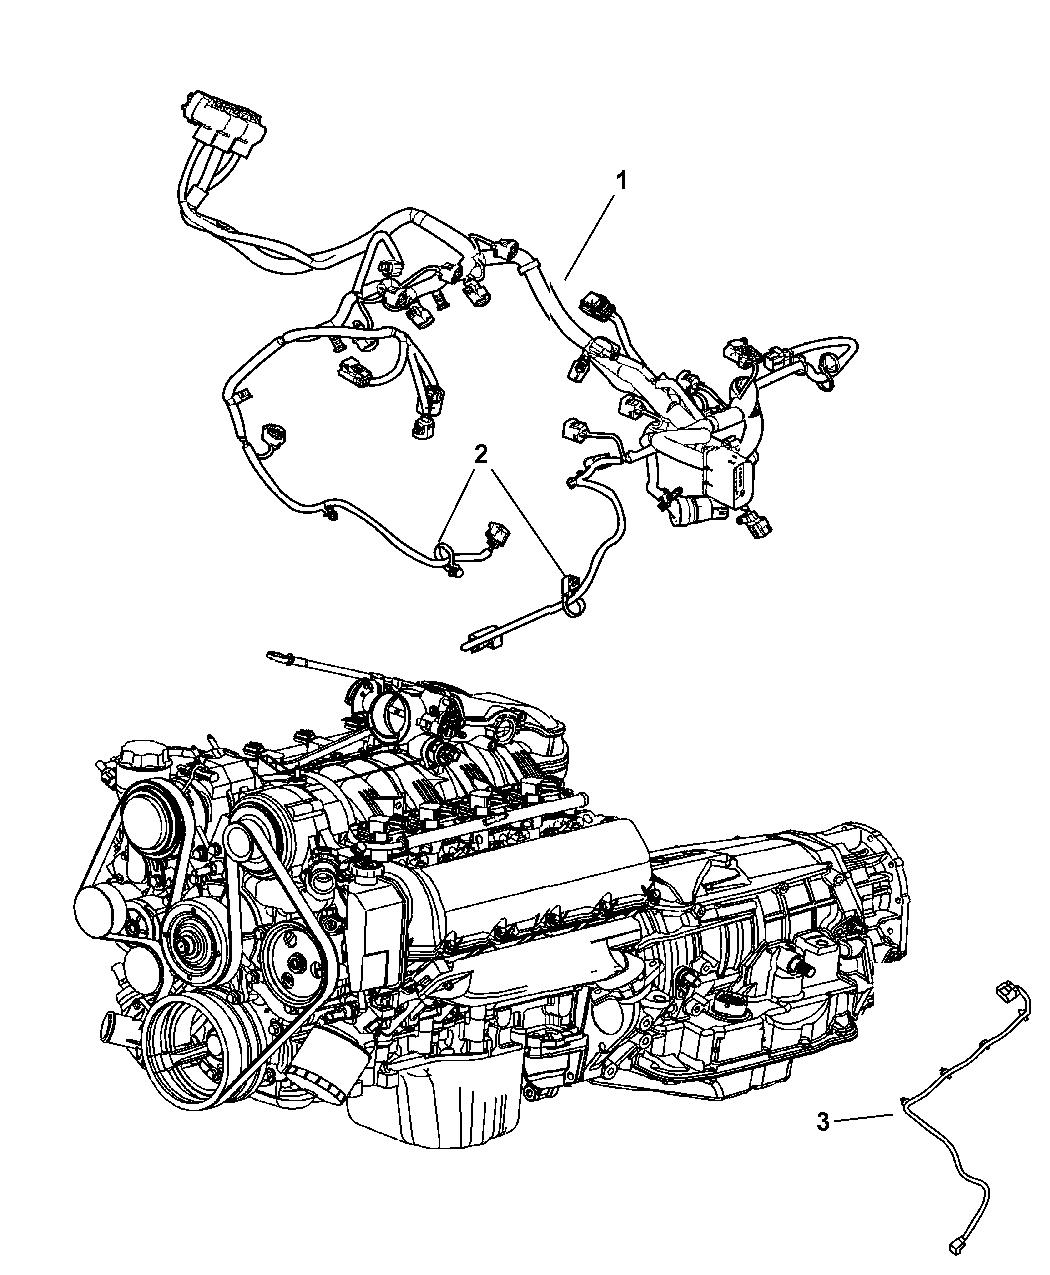 2007 Jeep Commander Wiring - Engine - Mopar Parts Giant Jeep Commander Transfer Case Wiring Diagram on